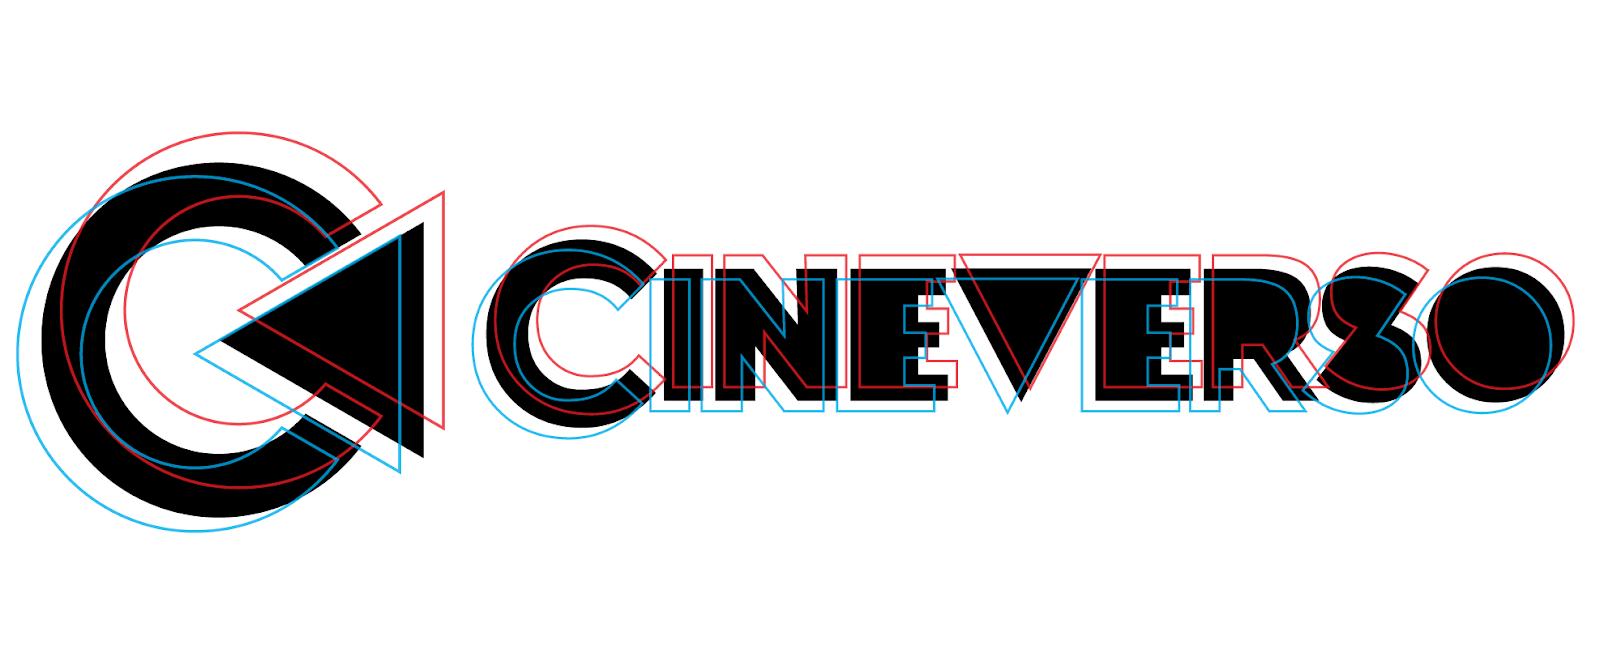 Cineverso | cineverso.com.br